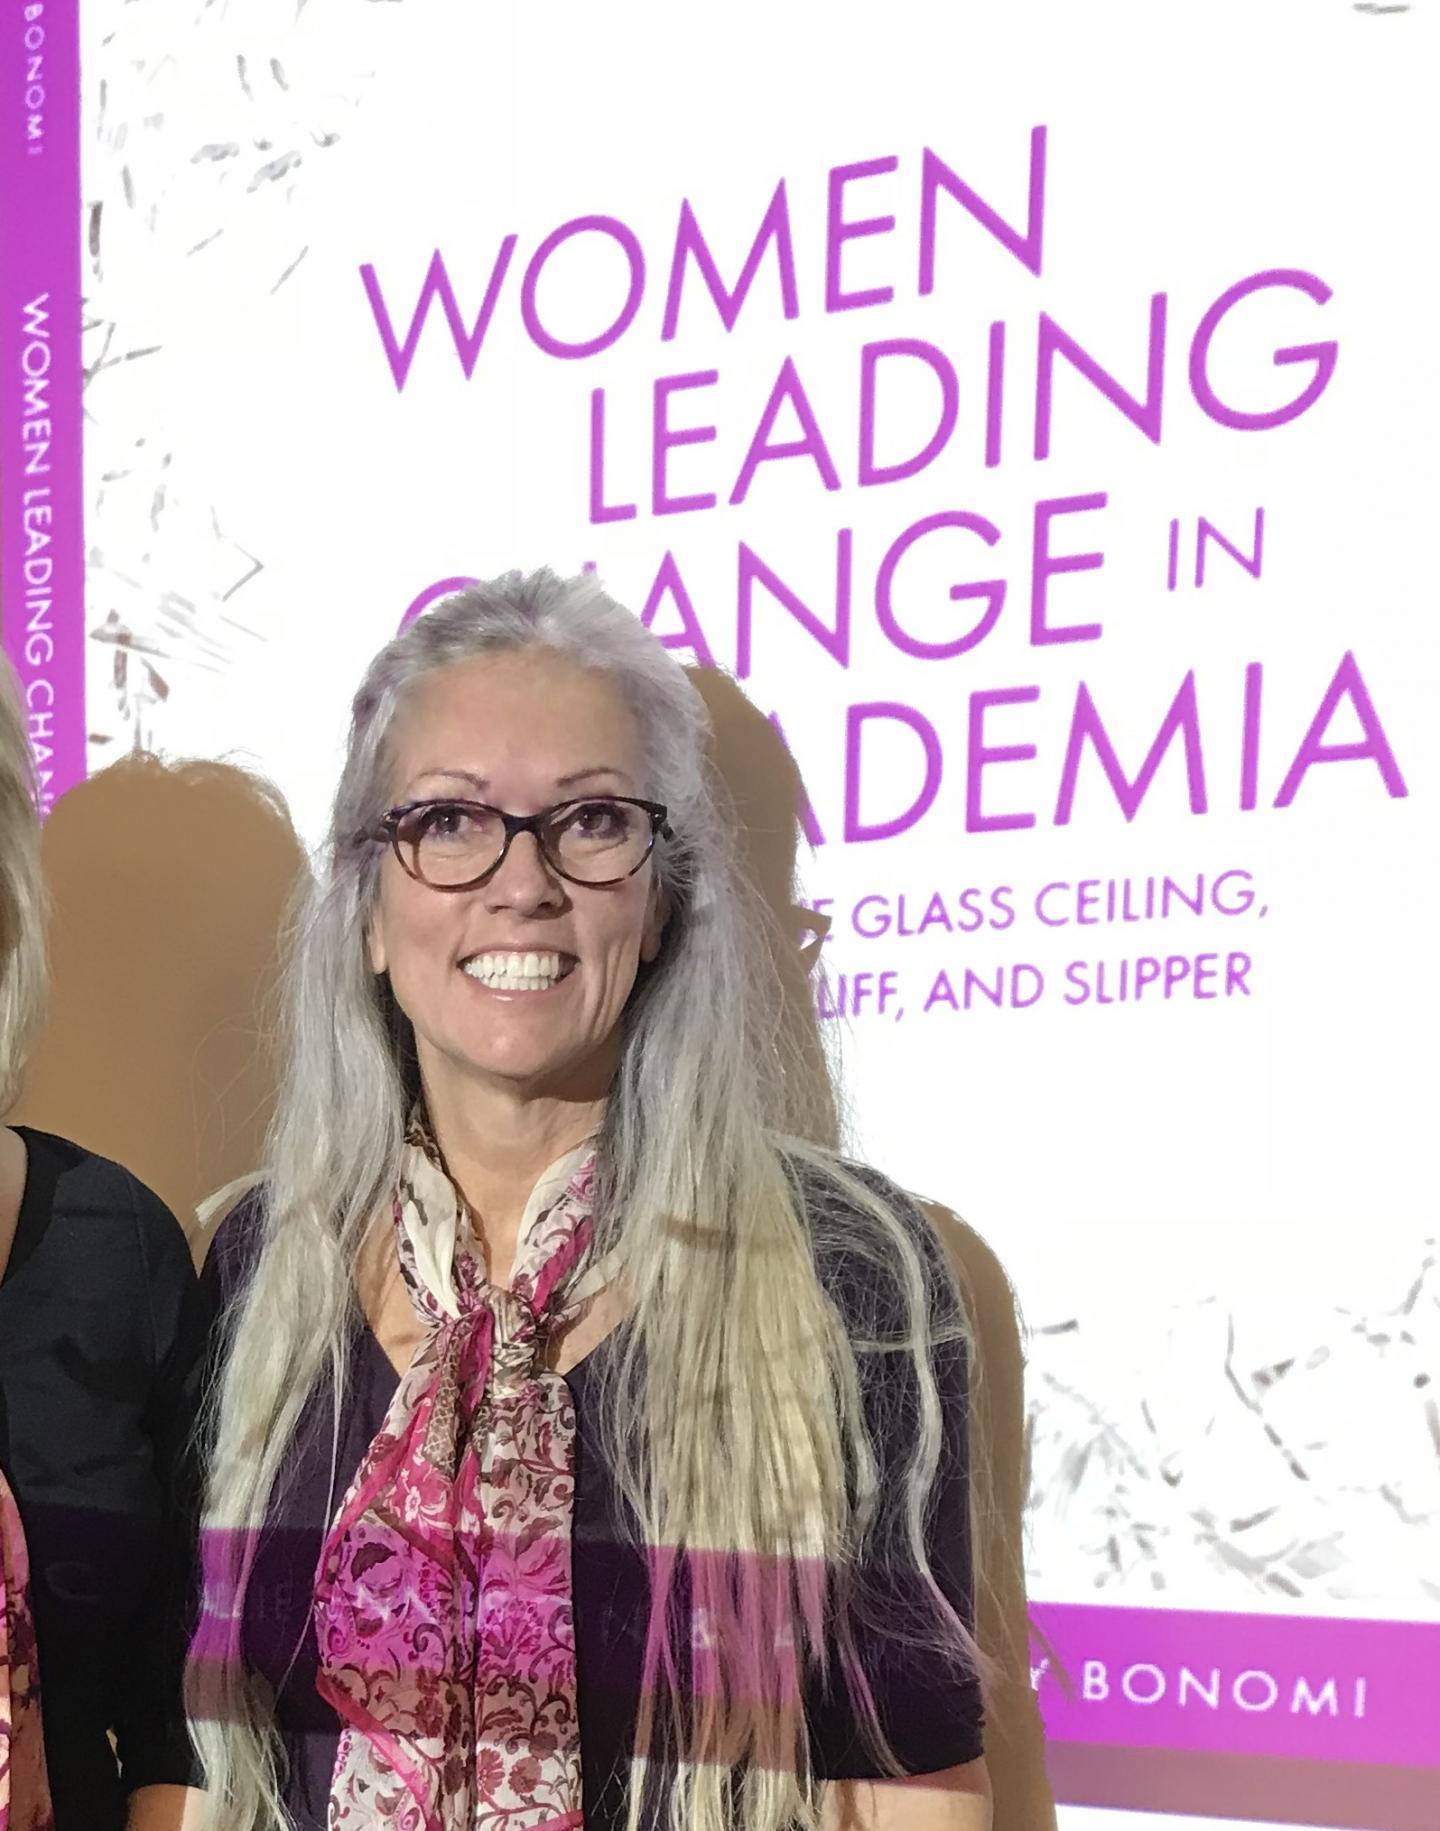 New book for female leaders in academia | EurekAlert! Science News